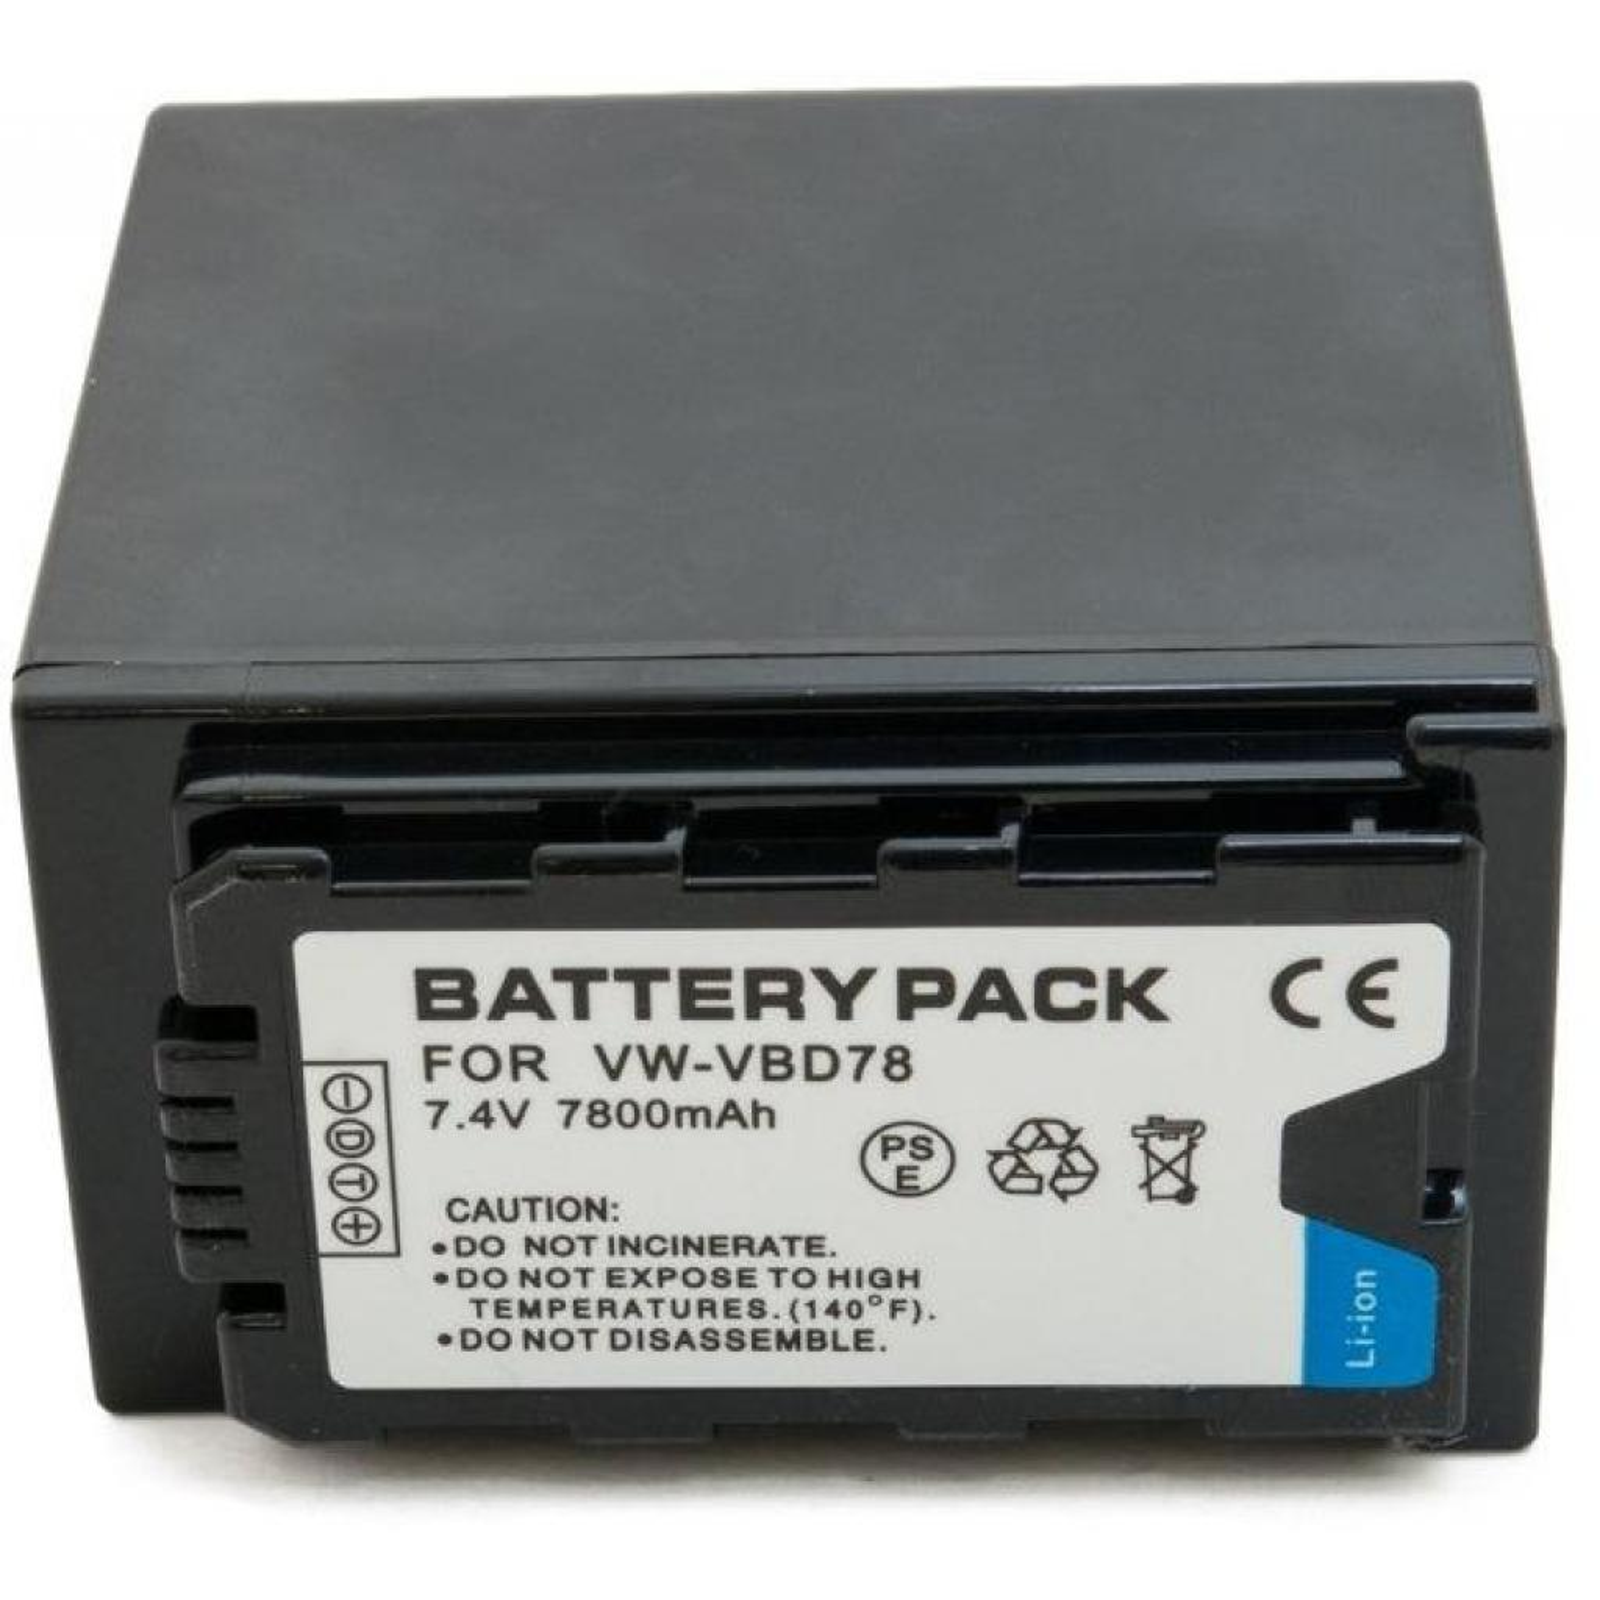 Аккумулятор к фото/видео EXTRADIGITAL Panasonic VW-VBD78, Li-ion, 7.4V, 7800mAh (BDP2694) изображение 3